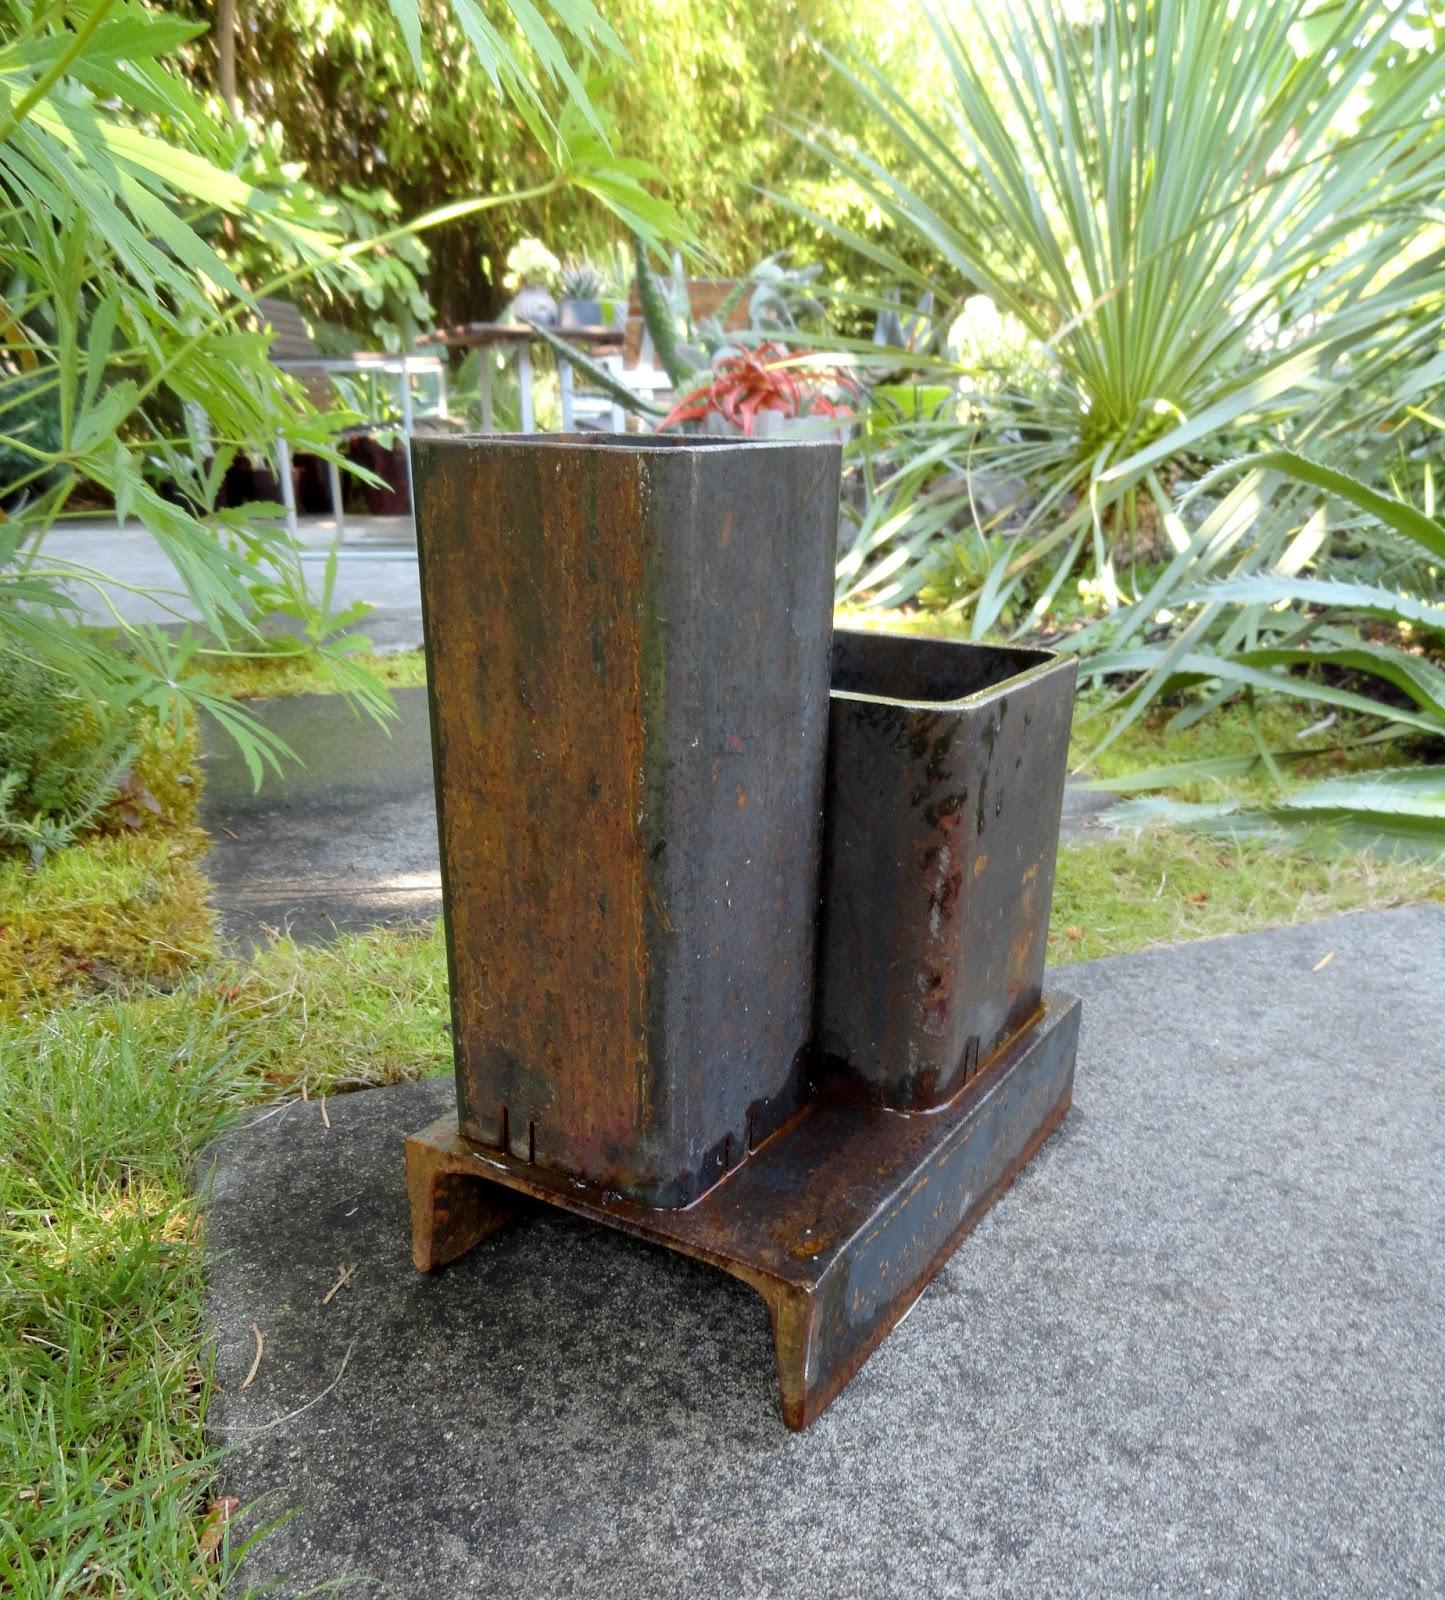 Danger garden cracked pots at mcmenamins edgefield 2017 for Garden pots portland